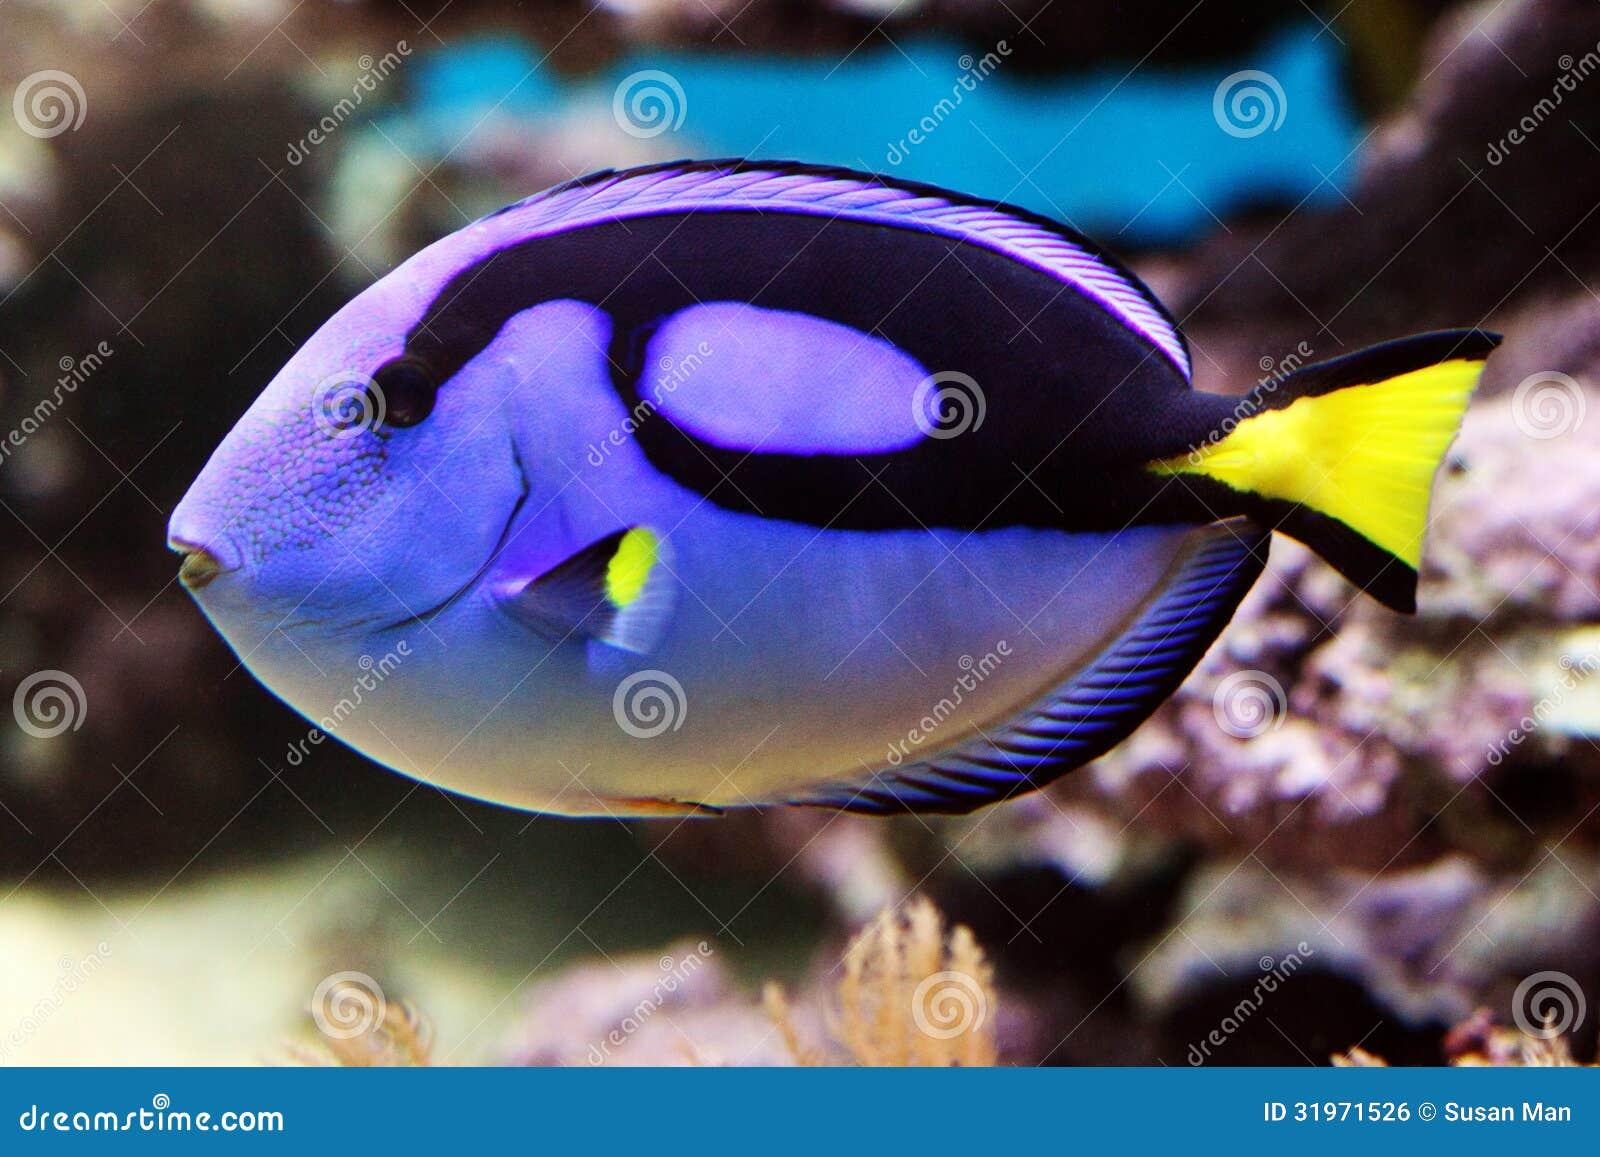 Blue tang paracanthursus hepatus royalty free stock for Popular saltwater fish